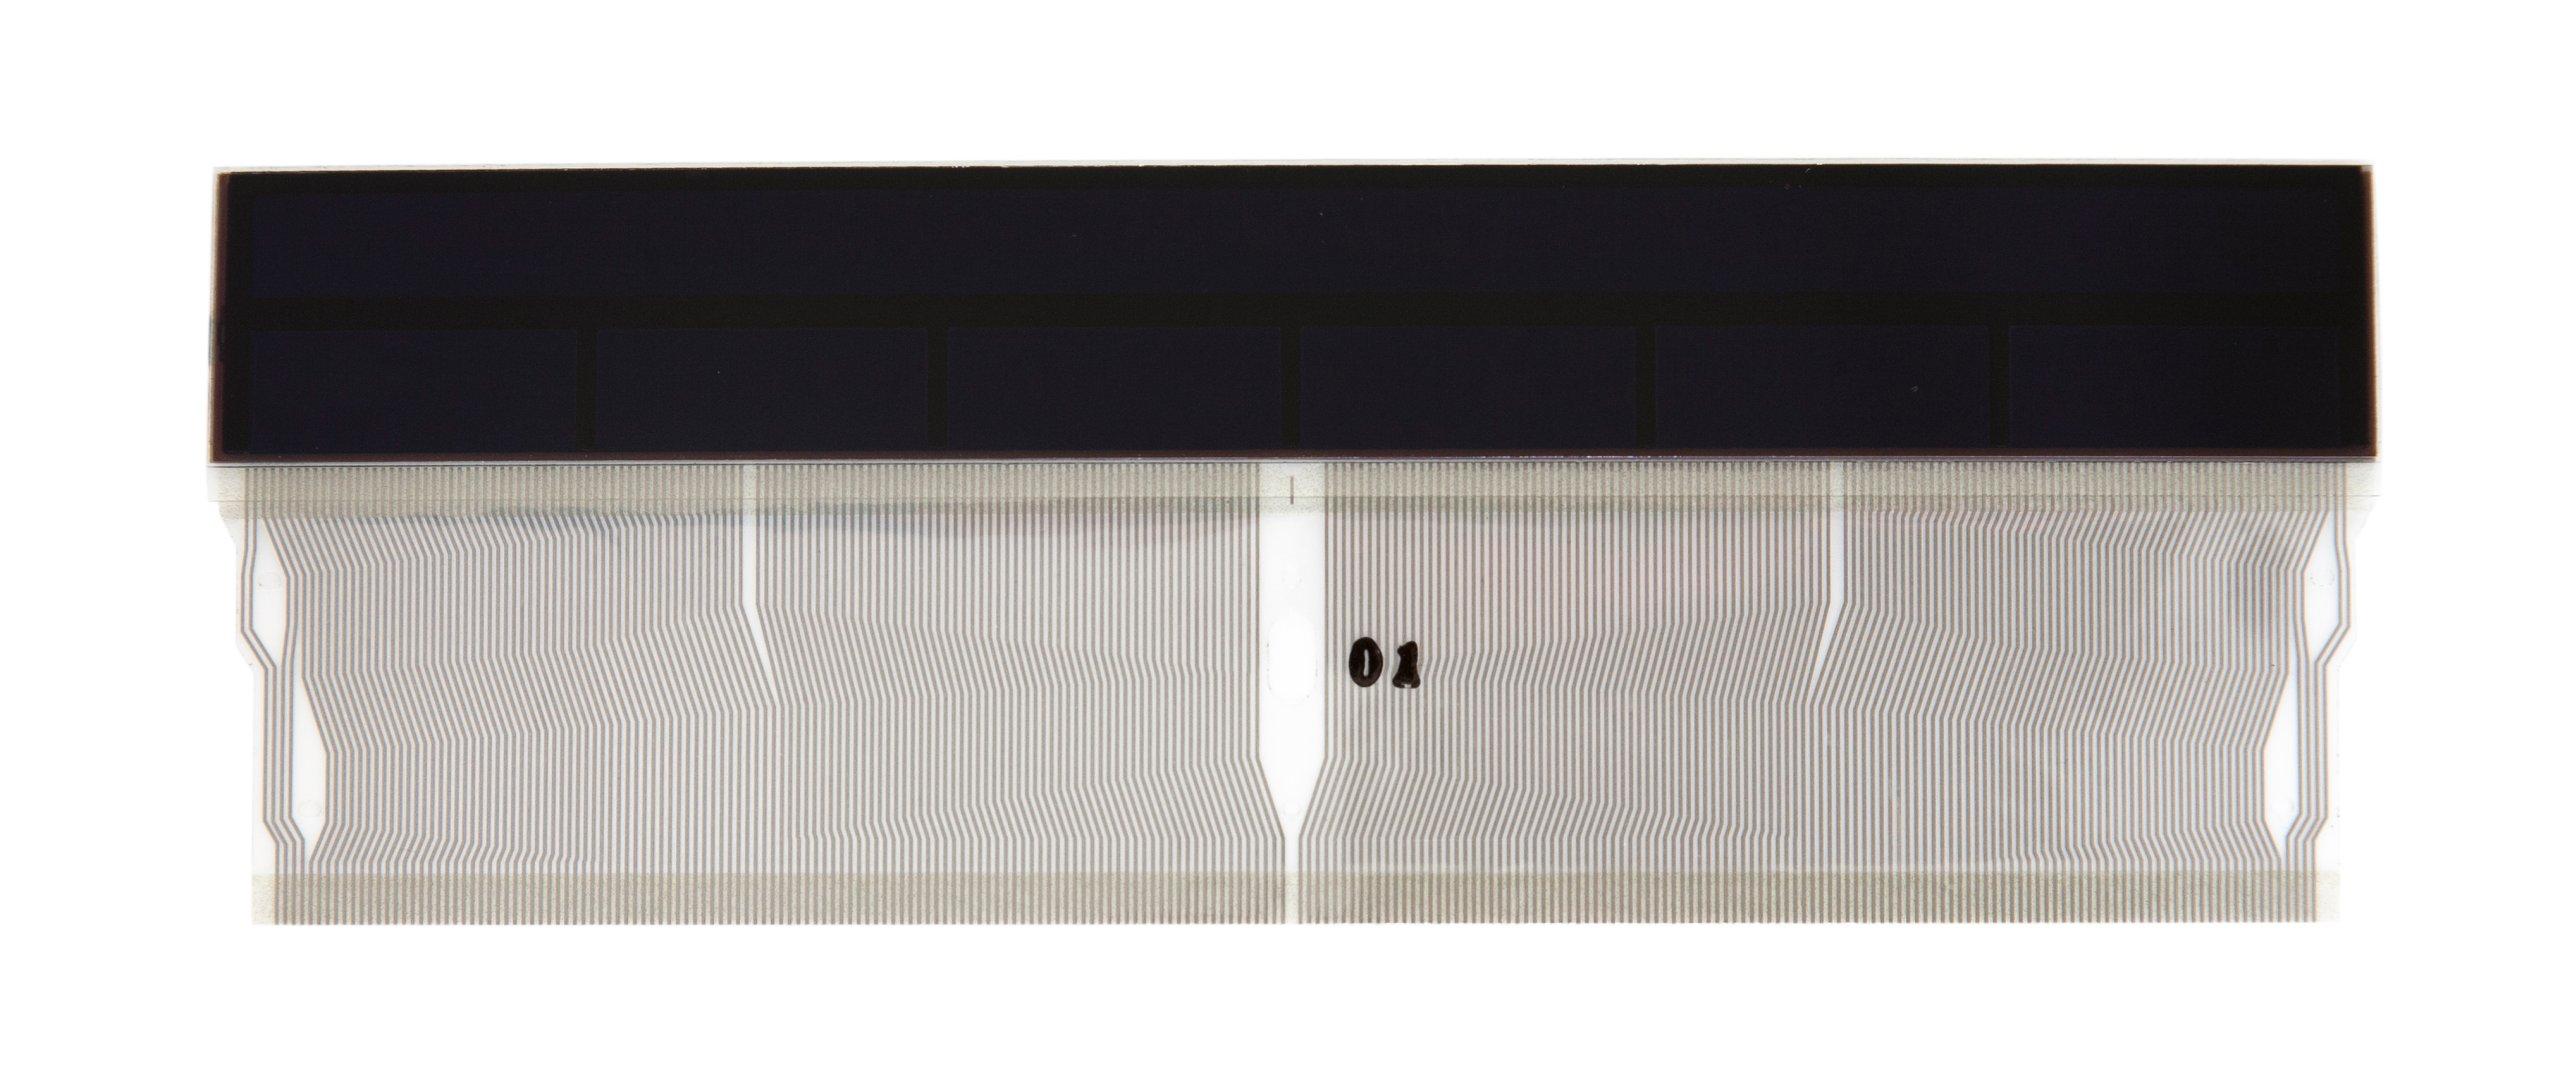 дисплей радио mid bmw e38e39e53 x5  новый